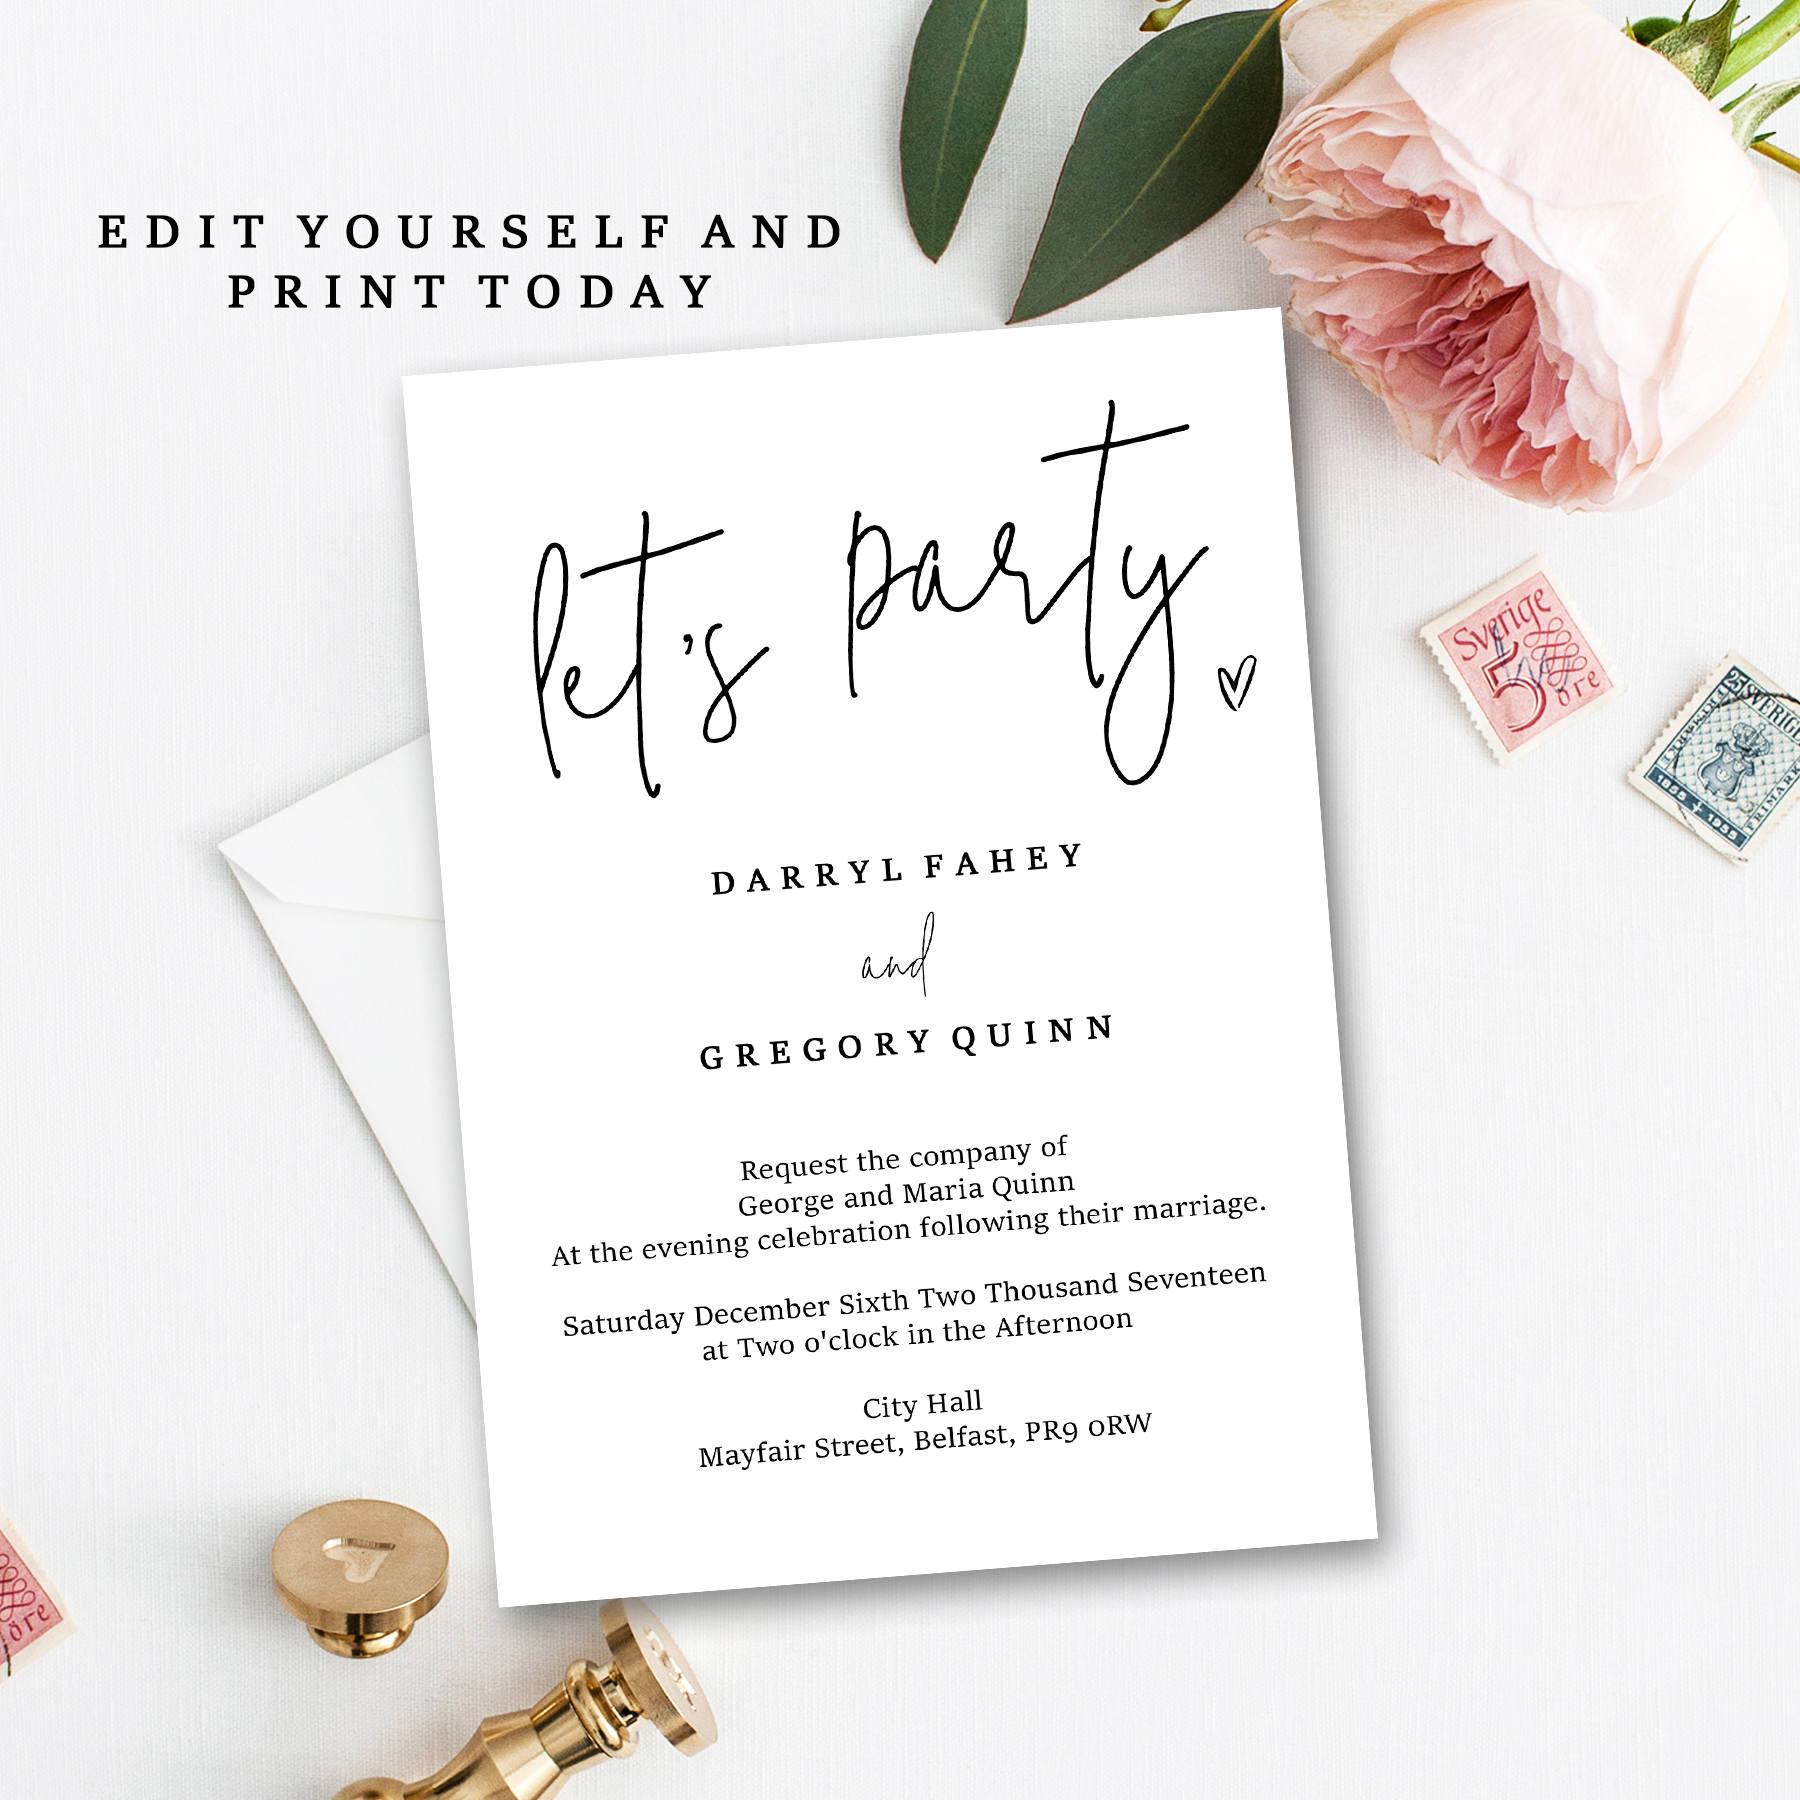 Evening reception invite printable instant download edit zoom solutioingenieria Gallery